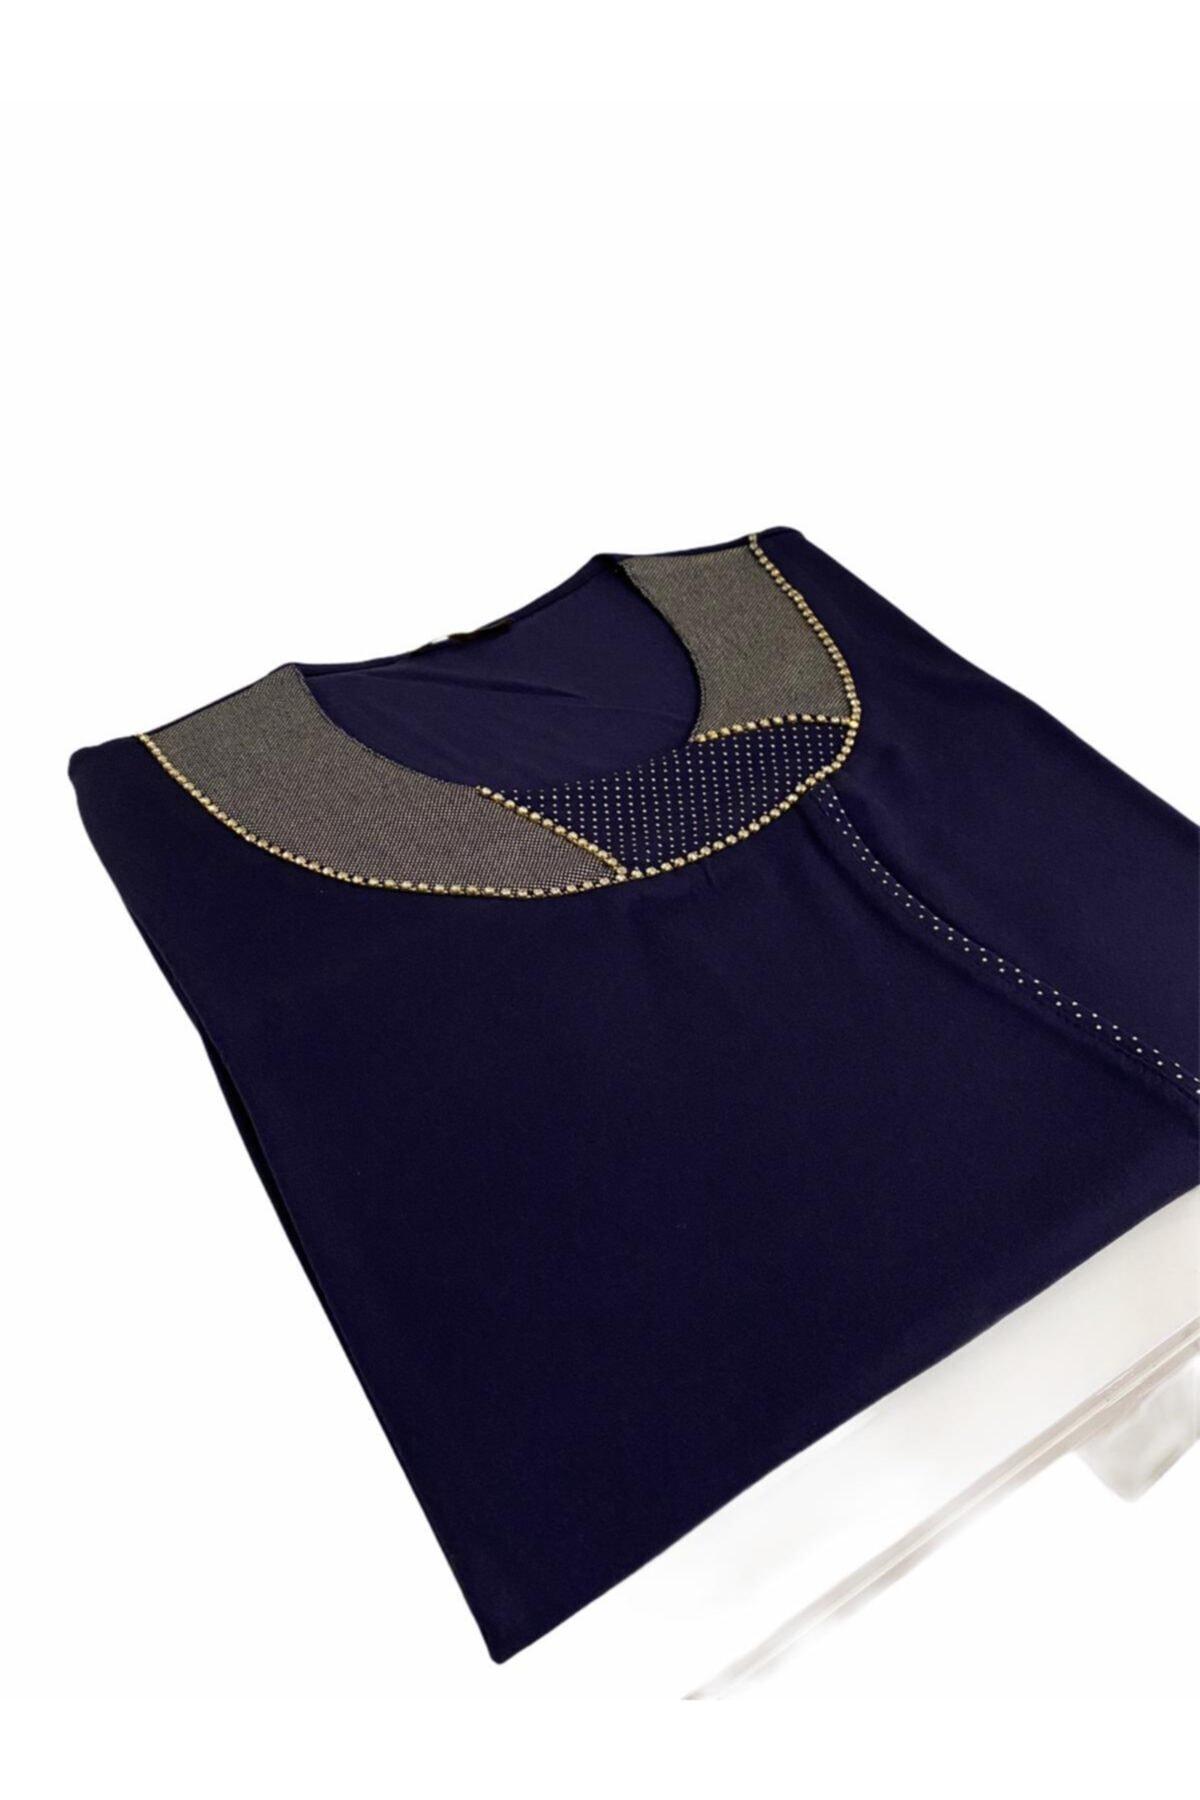 Elele Lacivert Parlak Taş Dizili O Yaka Penye Bluz 2